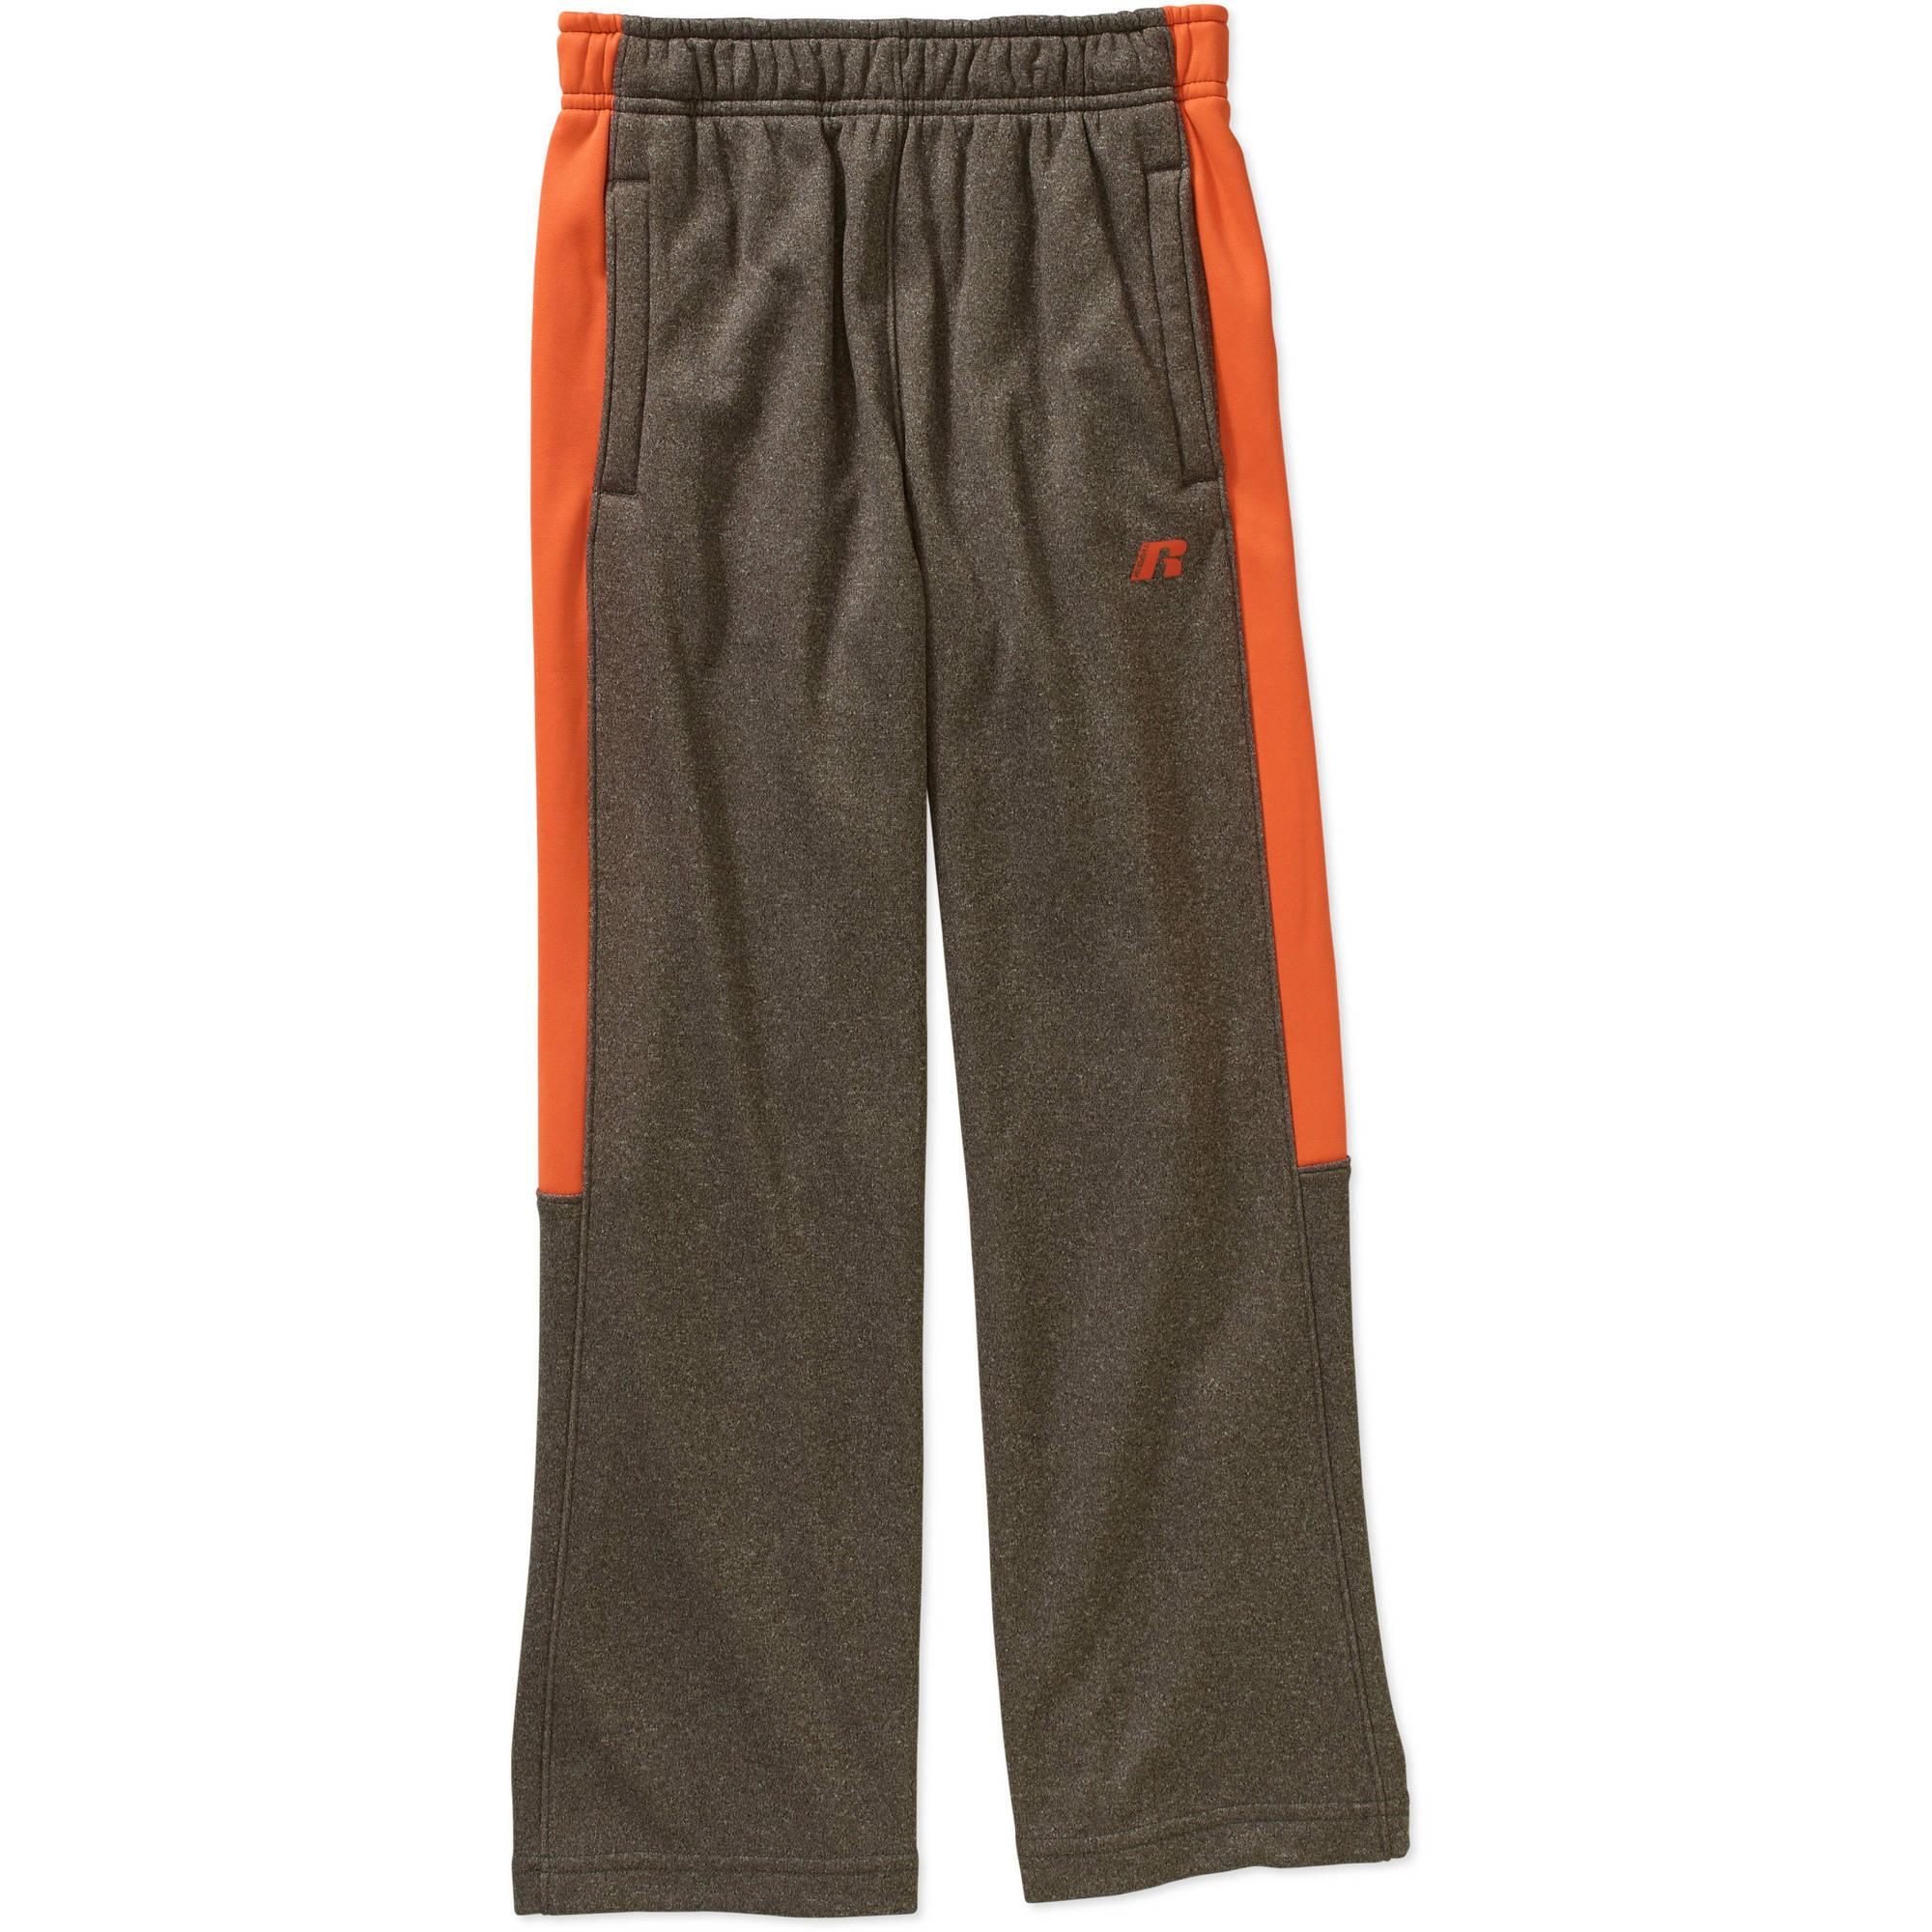 Russell Boys' Color Block Elastic Waistband Tech Fleece Pants with Pockets